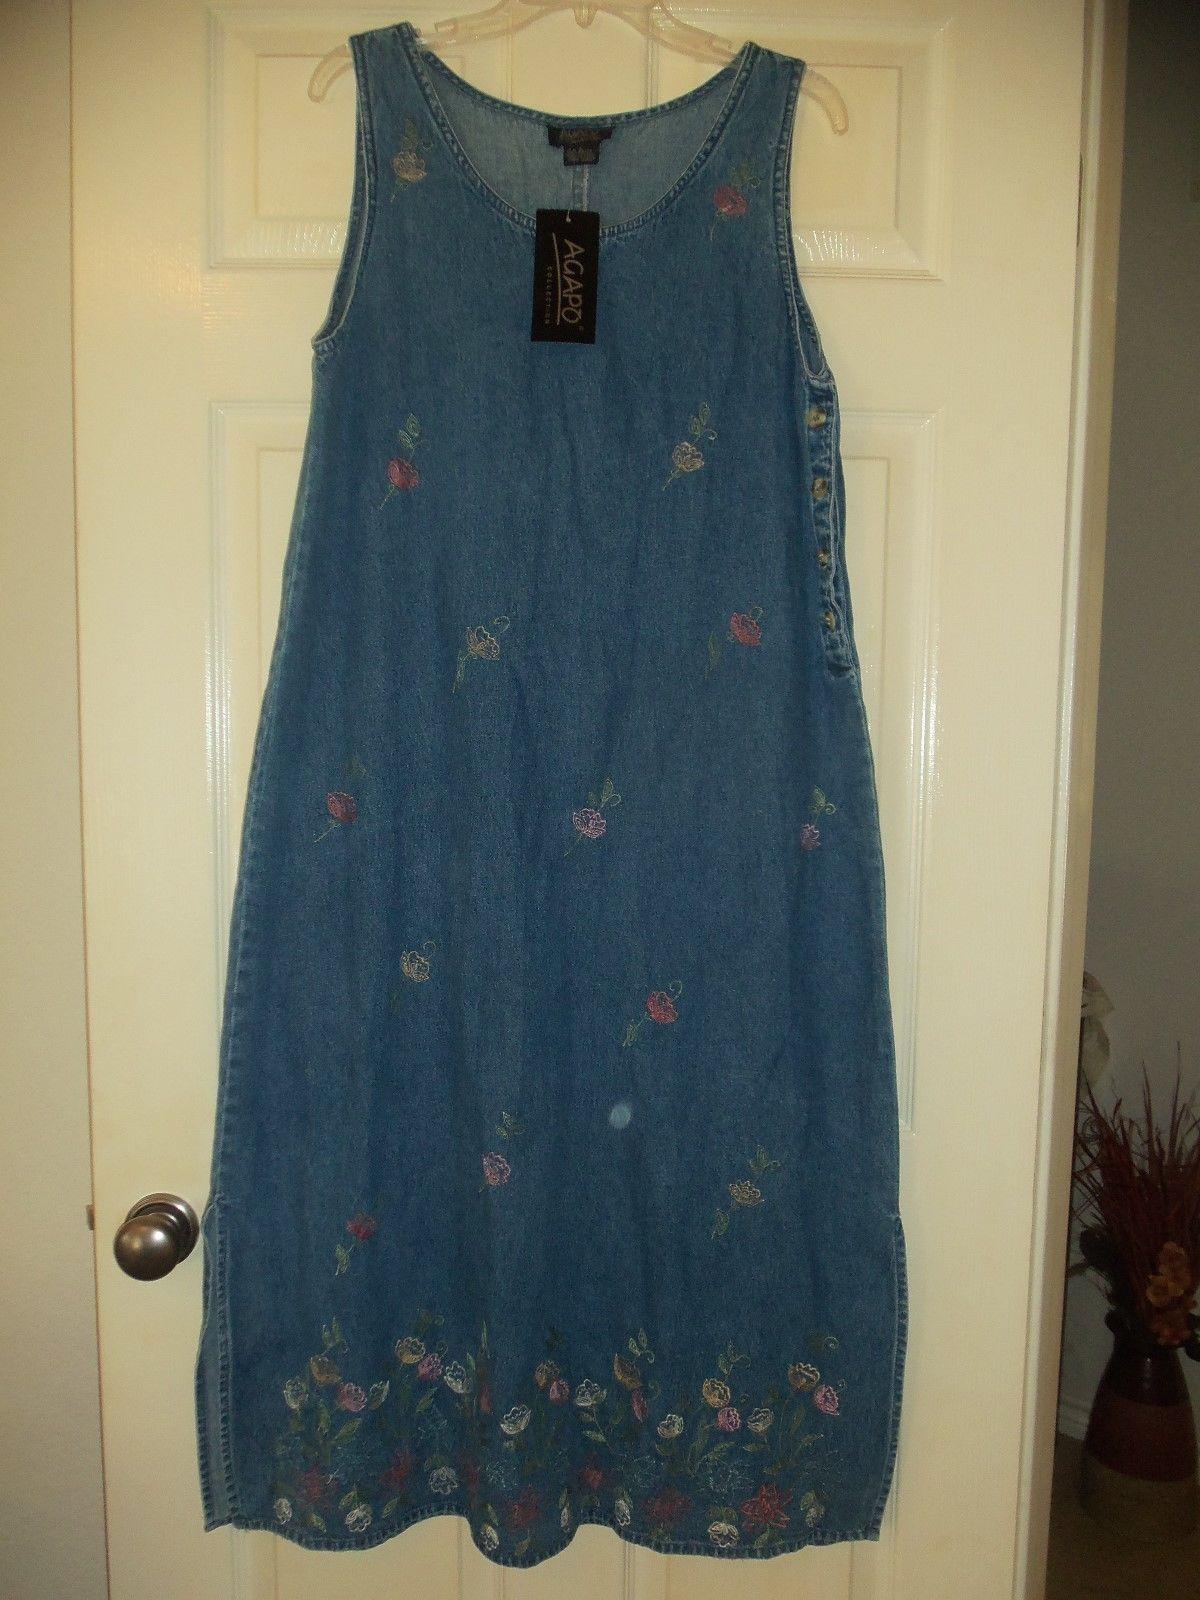 Long Denim Jean Jumper Dress Sz Large Embroidered NEW